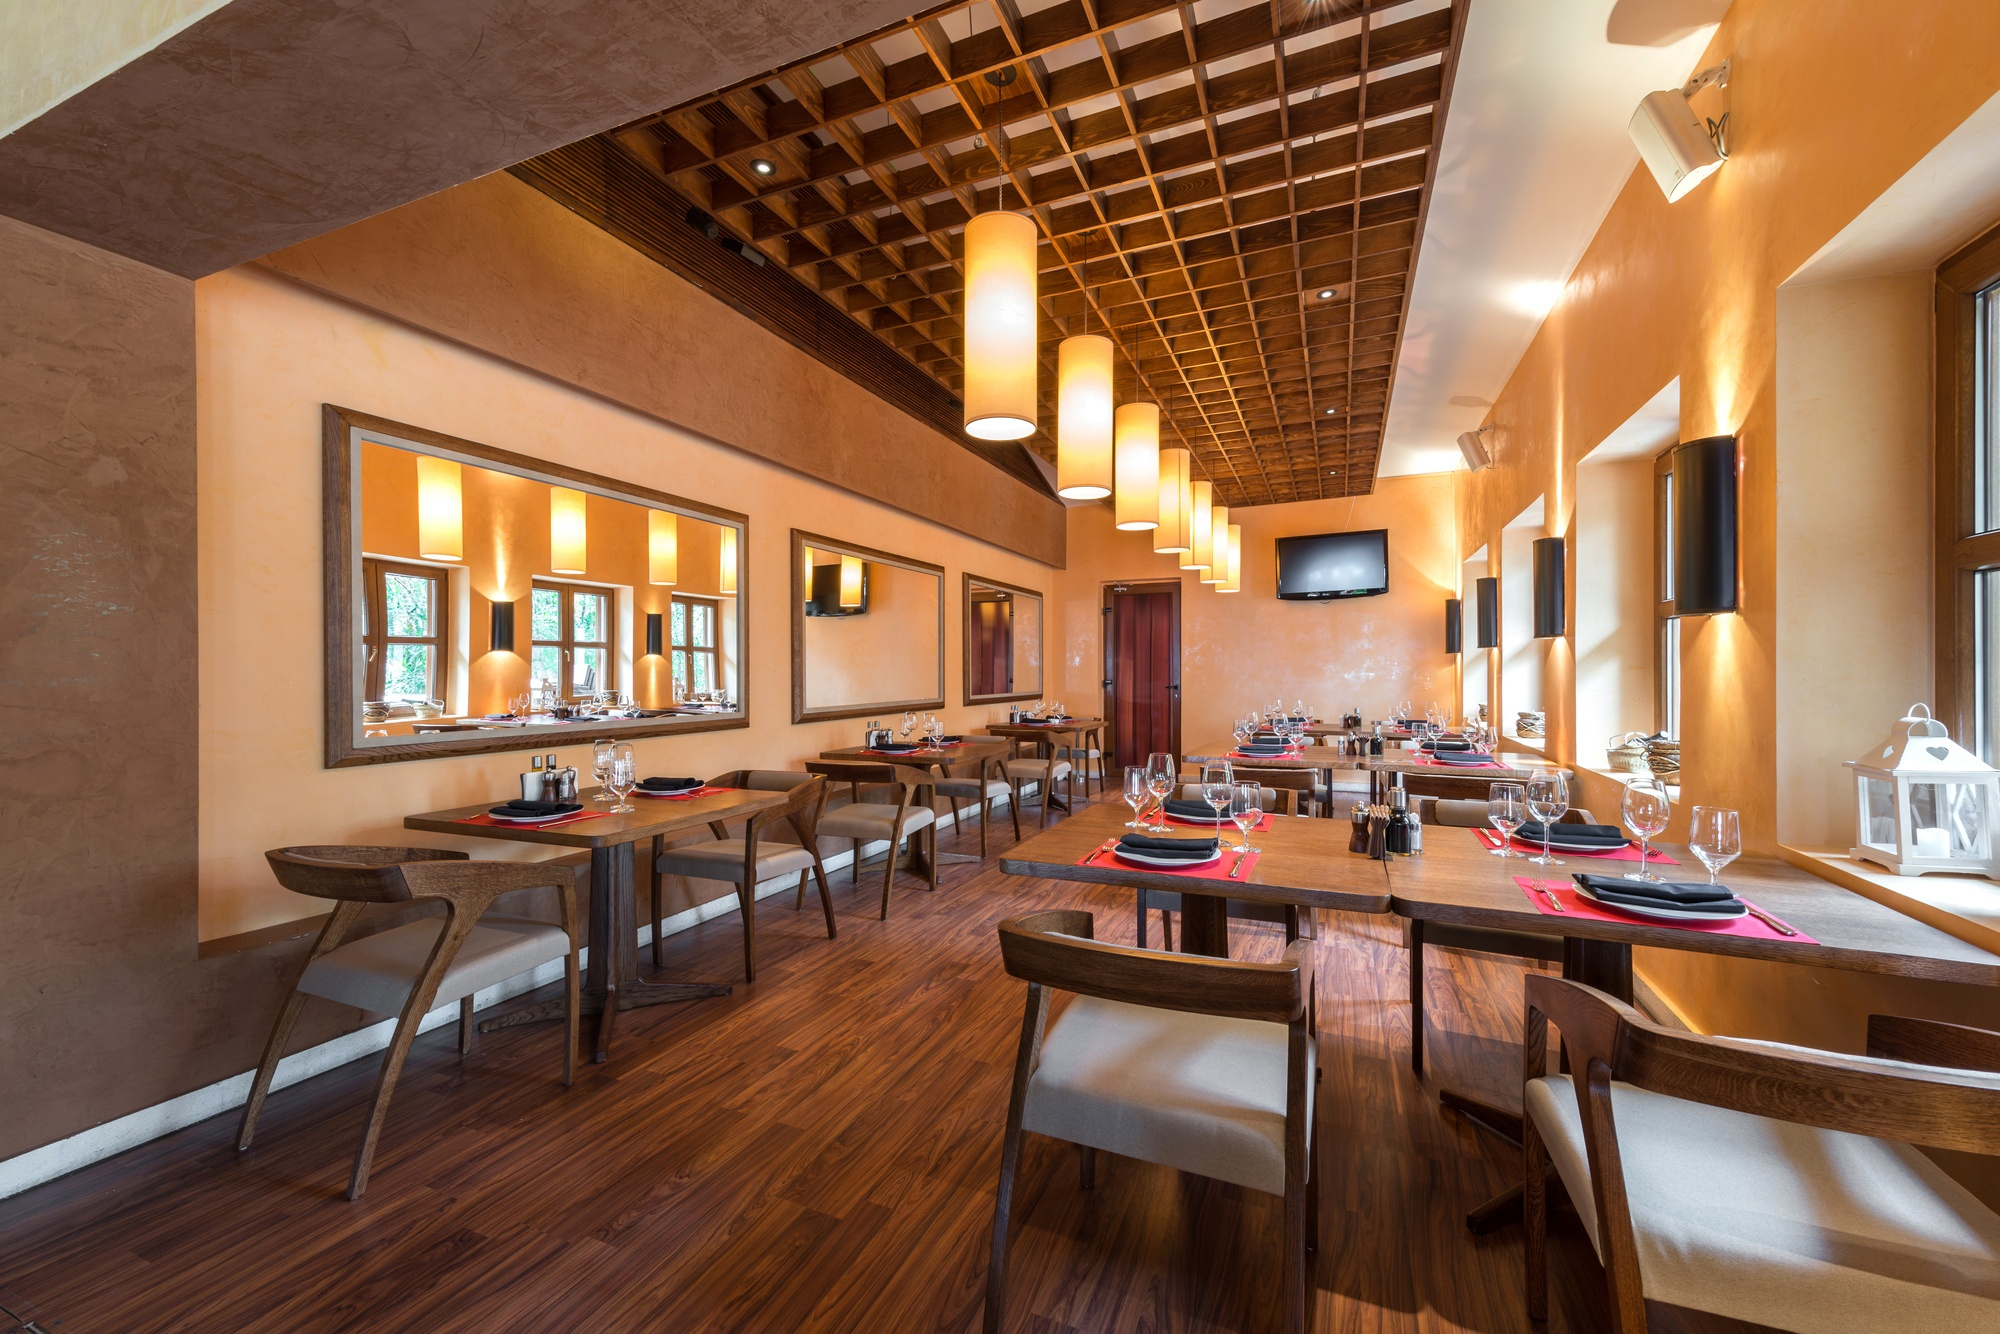 Restaurant Lighting Design Designblendz